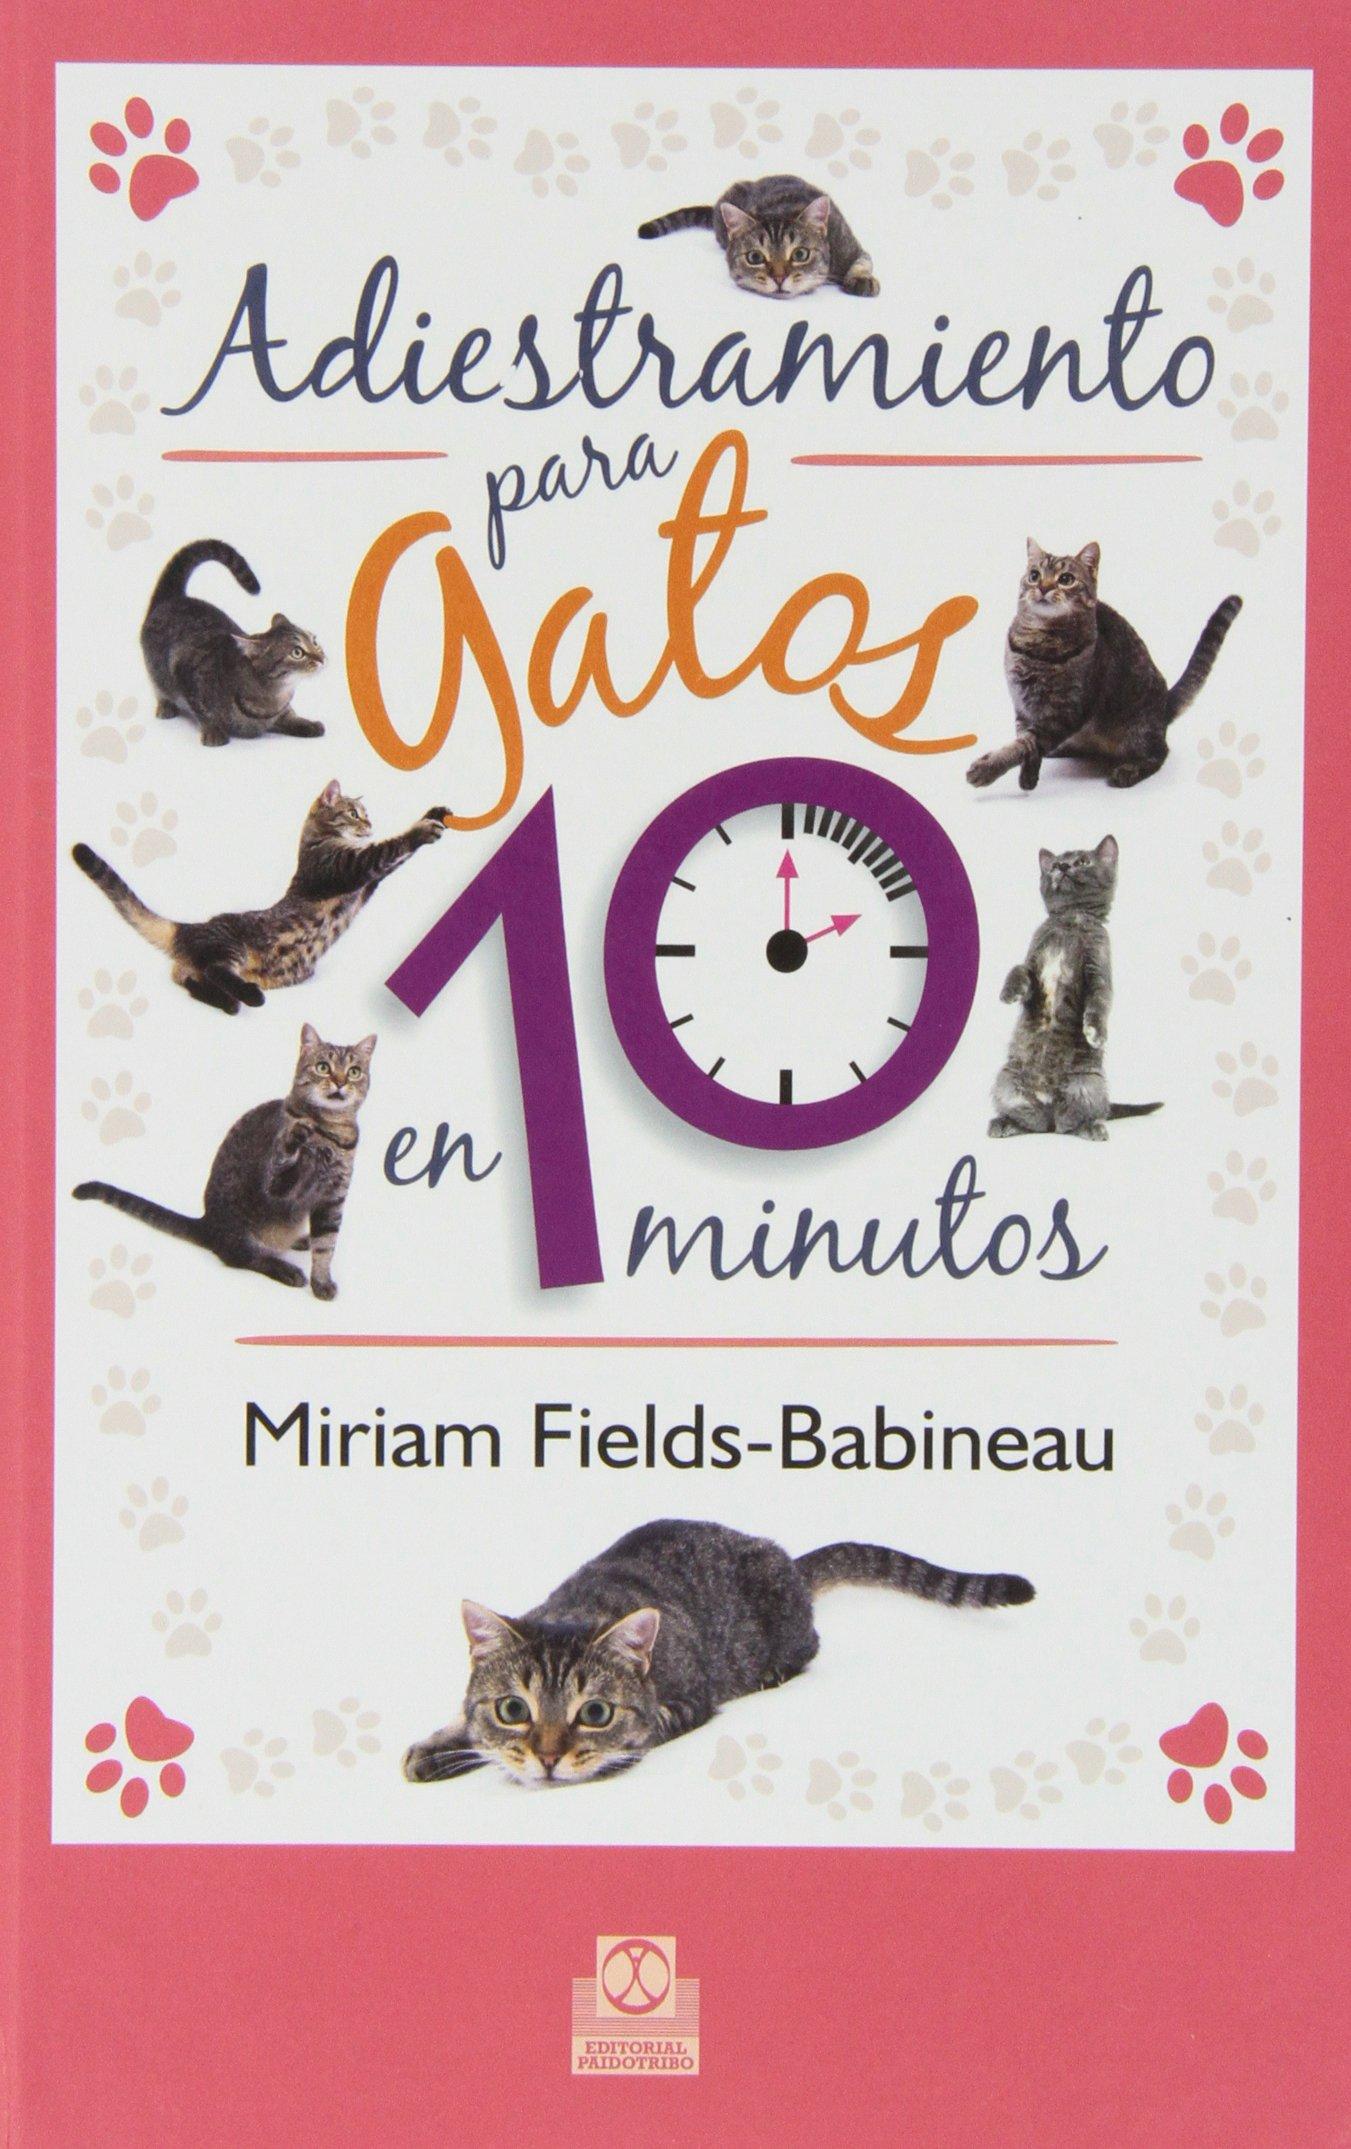 Adiestramiento para gatos en 10 minutos (Spanish Edition) (Spanish) Hardcover – August 30, 2013